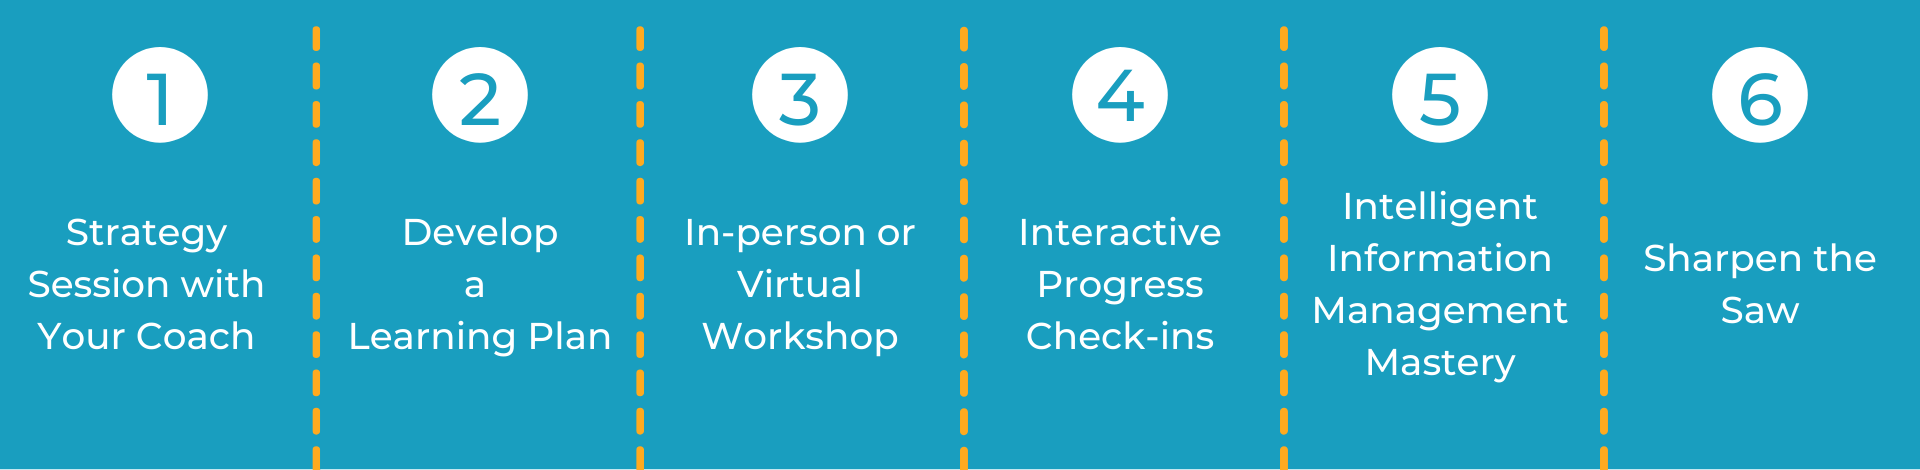 Intelligent Information Management Mastery Process